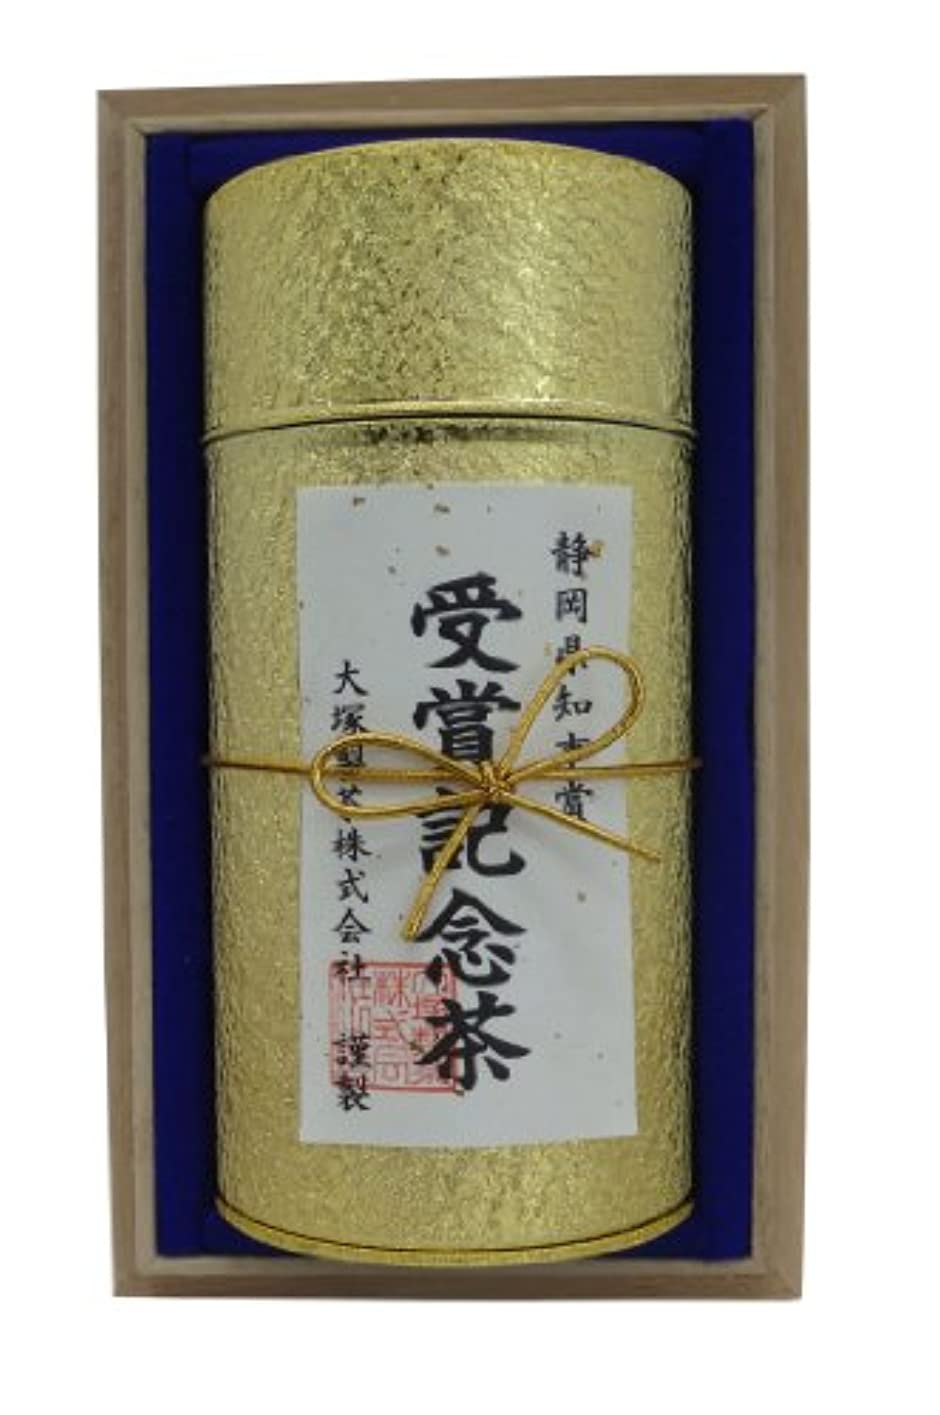 襟ミキサーランプ大塚製茶 静岡県知事賞受賞記念茶 200g